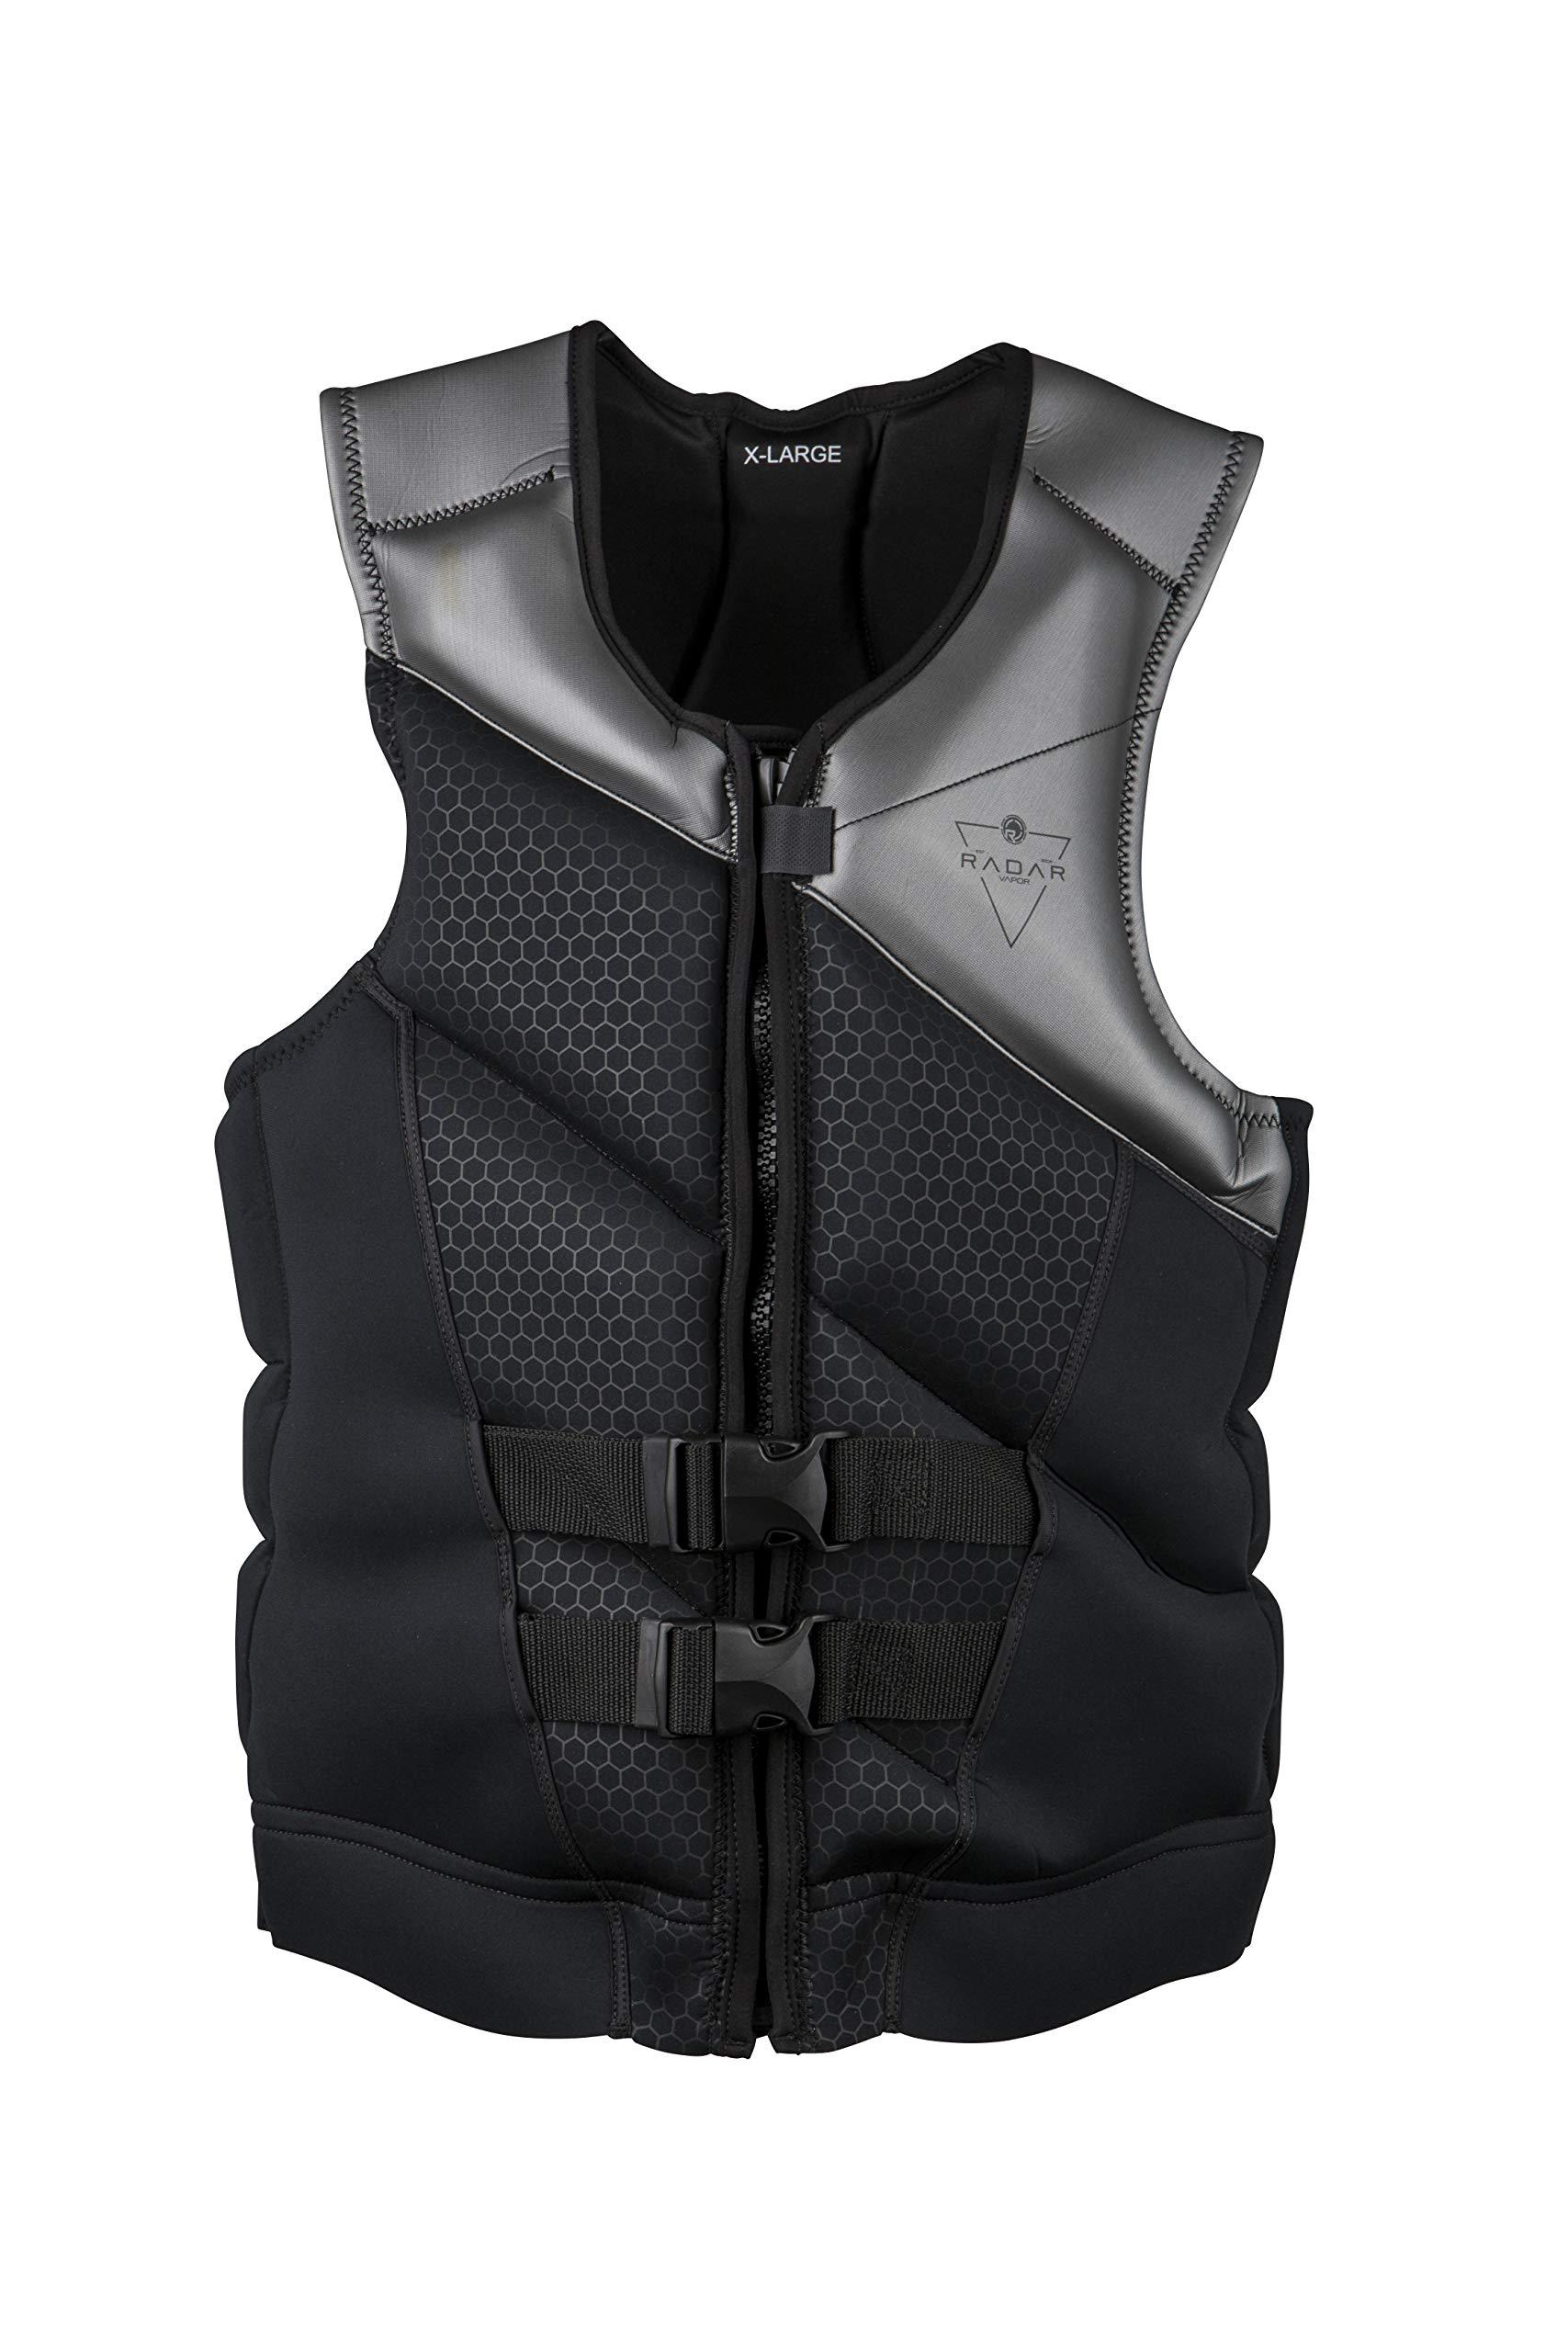 Radar X 2.0 - CGA Life Vest - Black / Gunmetal (2019), Large  by Radar